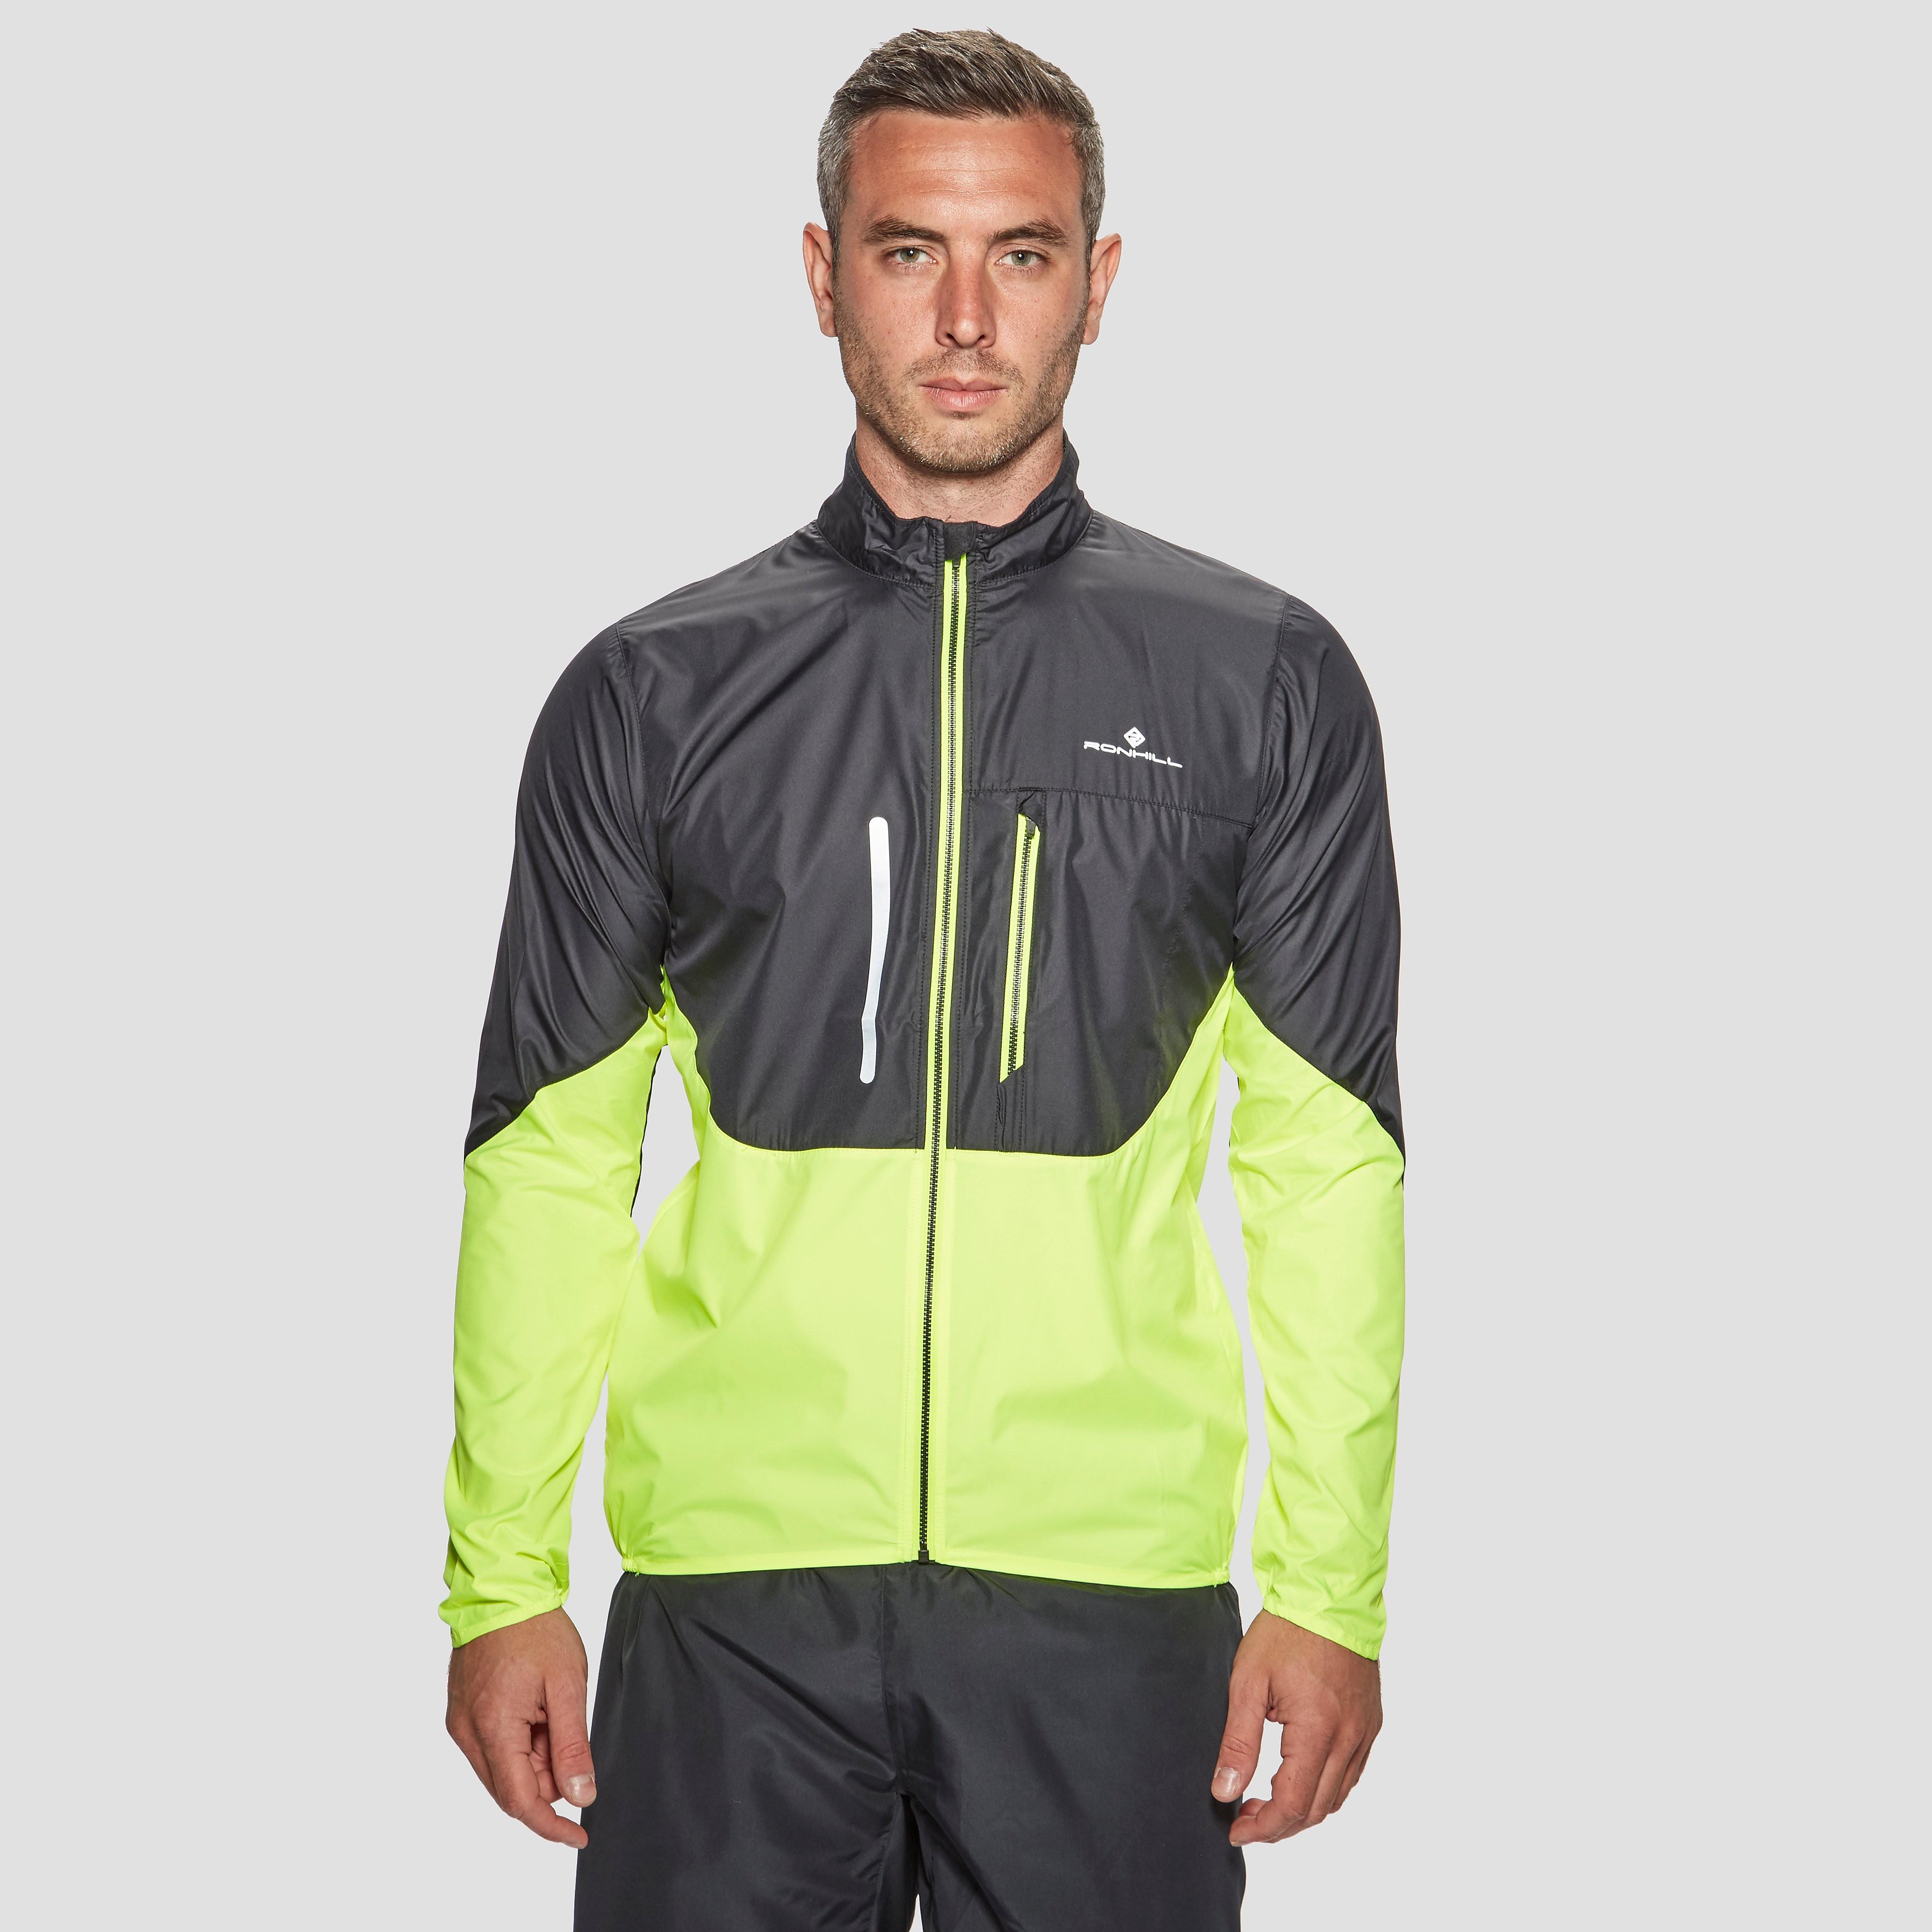 Ronhill Advance Windlite Men's Running Jacket